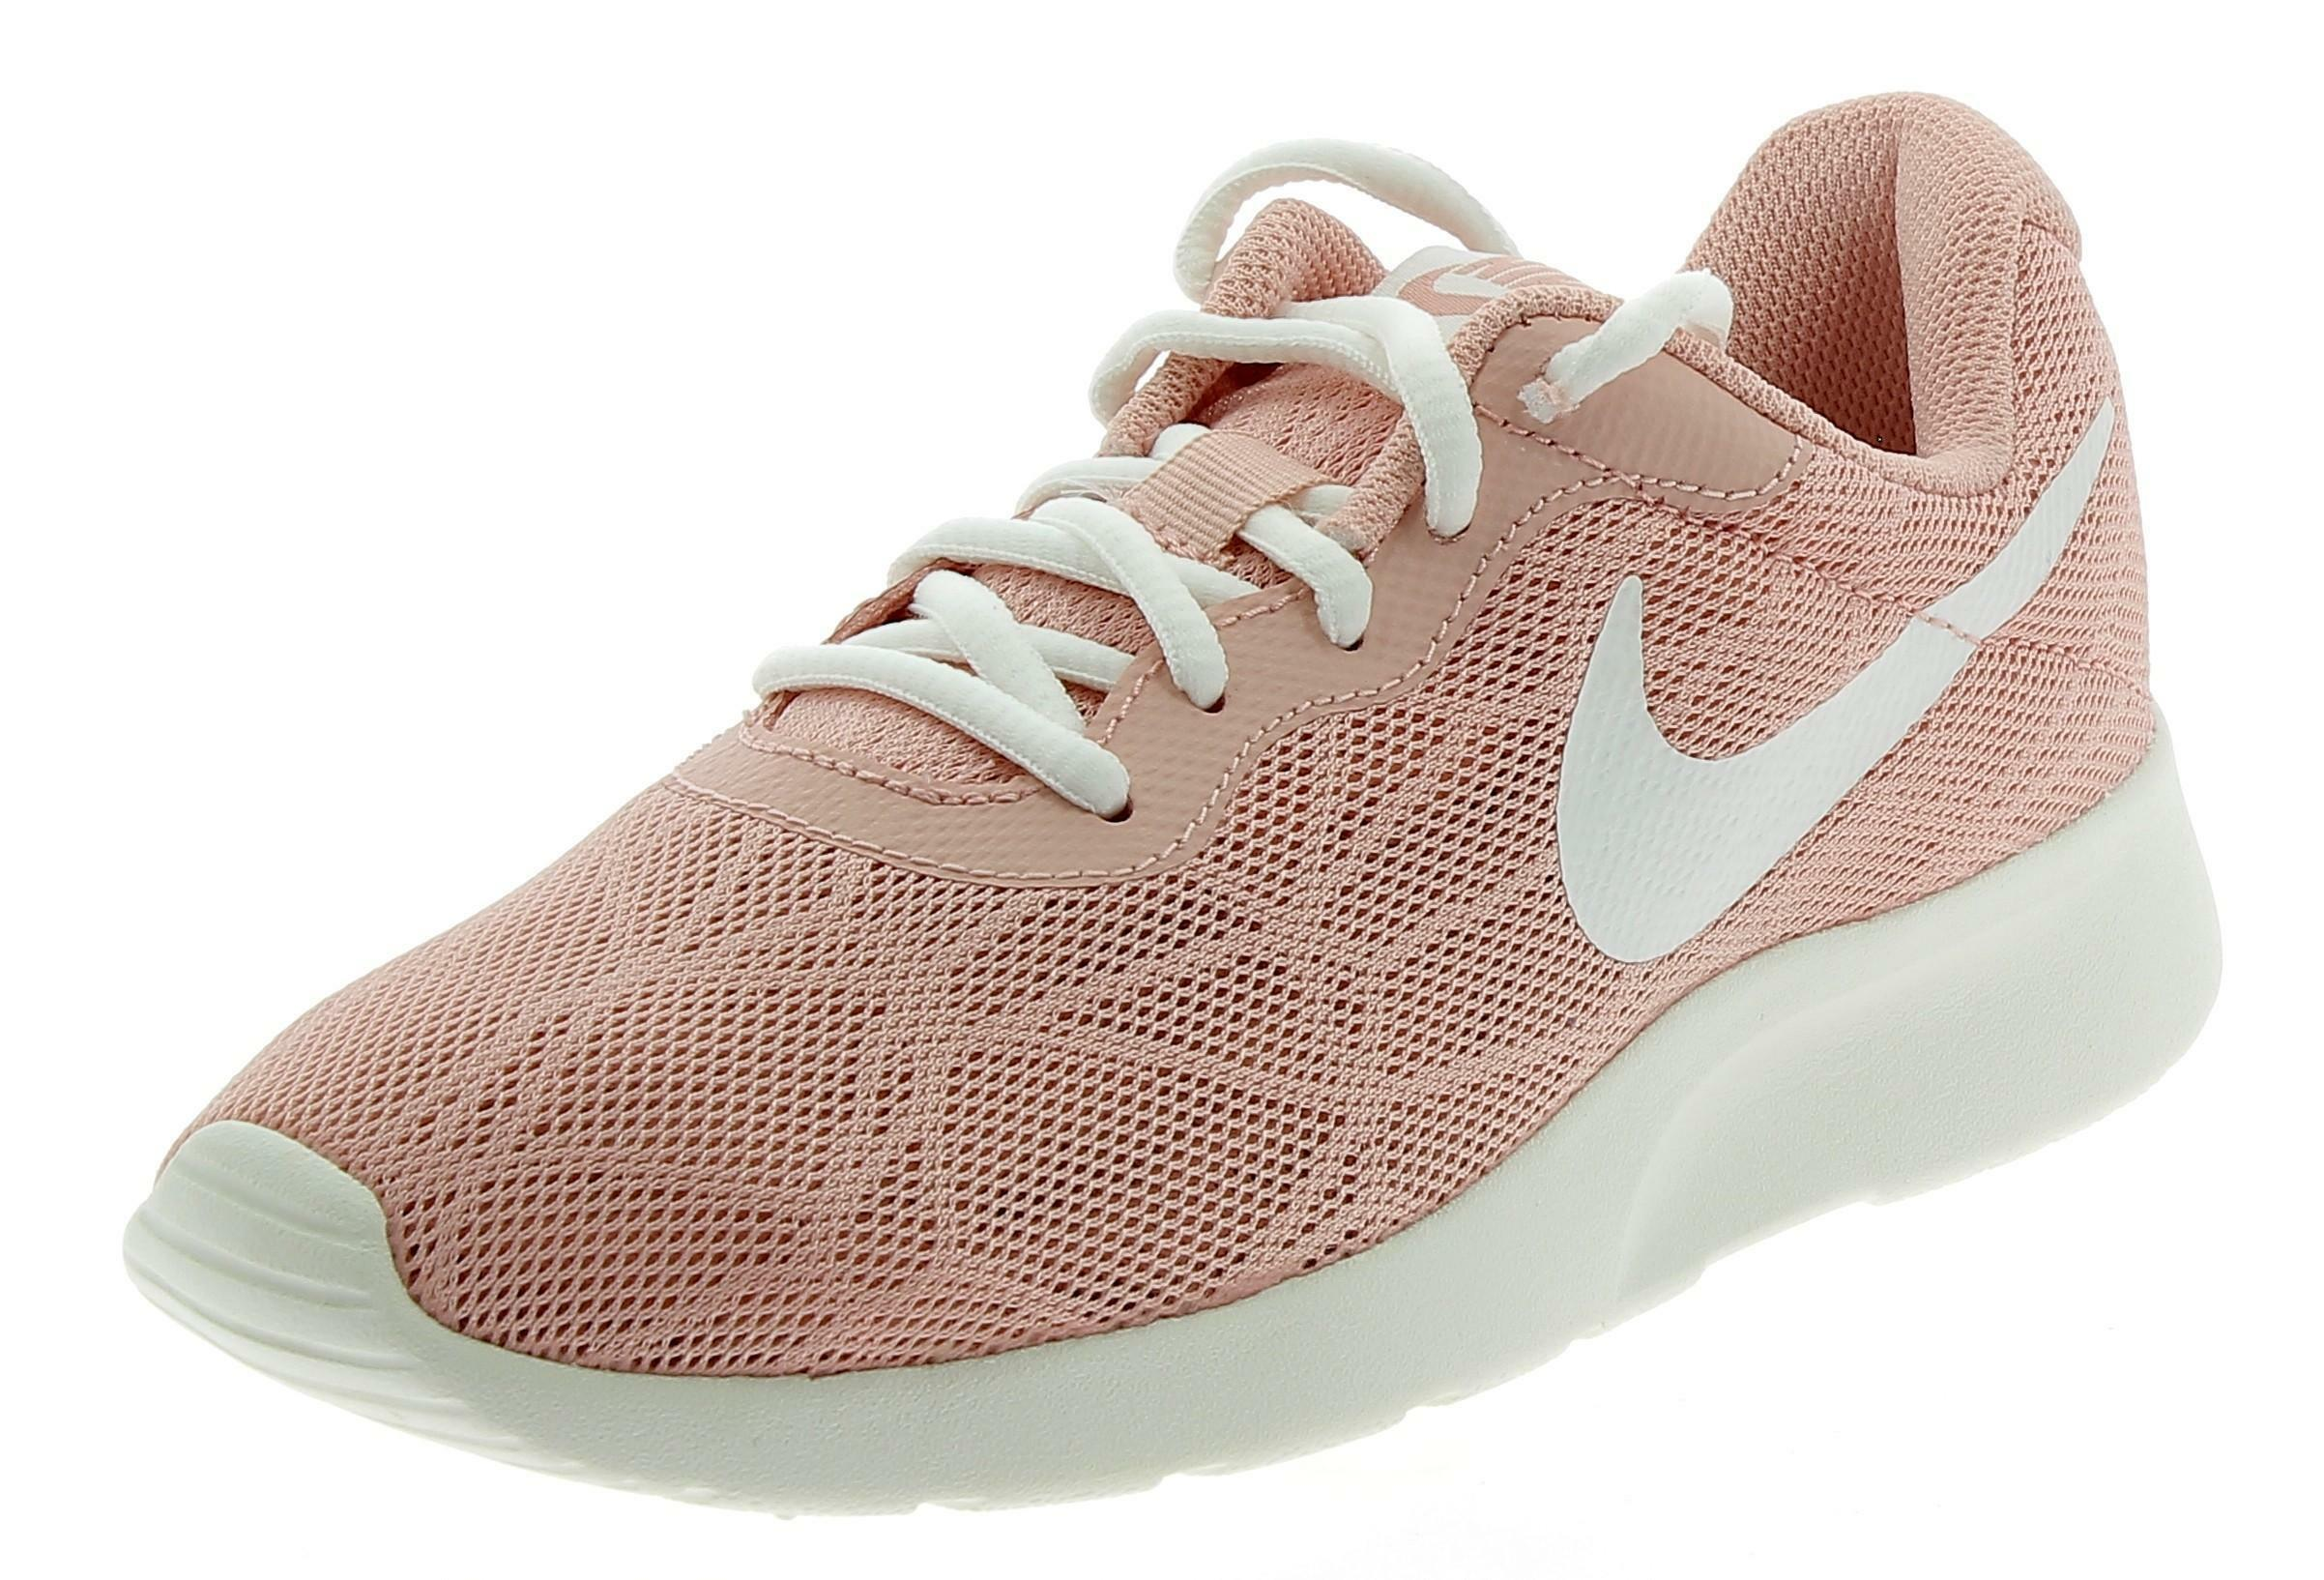 newest 616d2 28ea7 ... new zealand nike tanjun womens sports shoes pink 844908603 f24b9 4c4e5